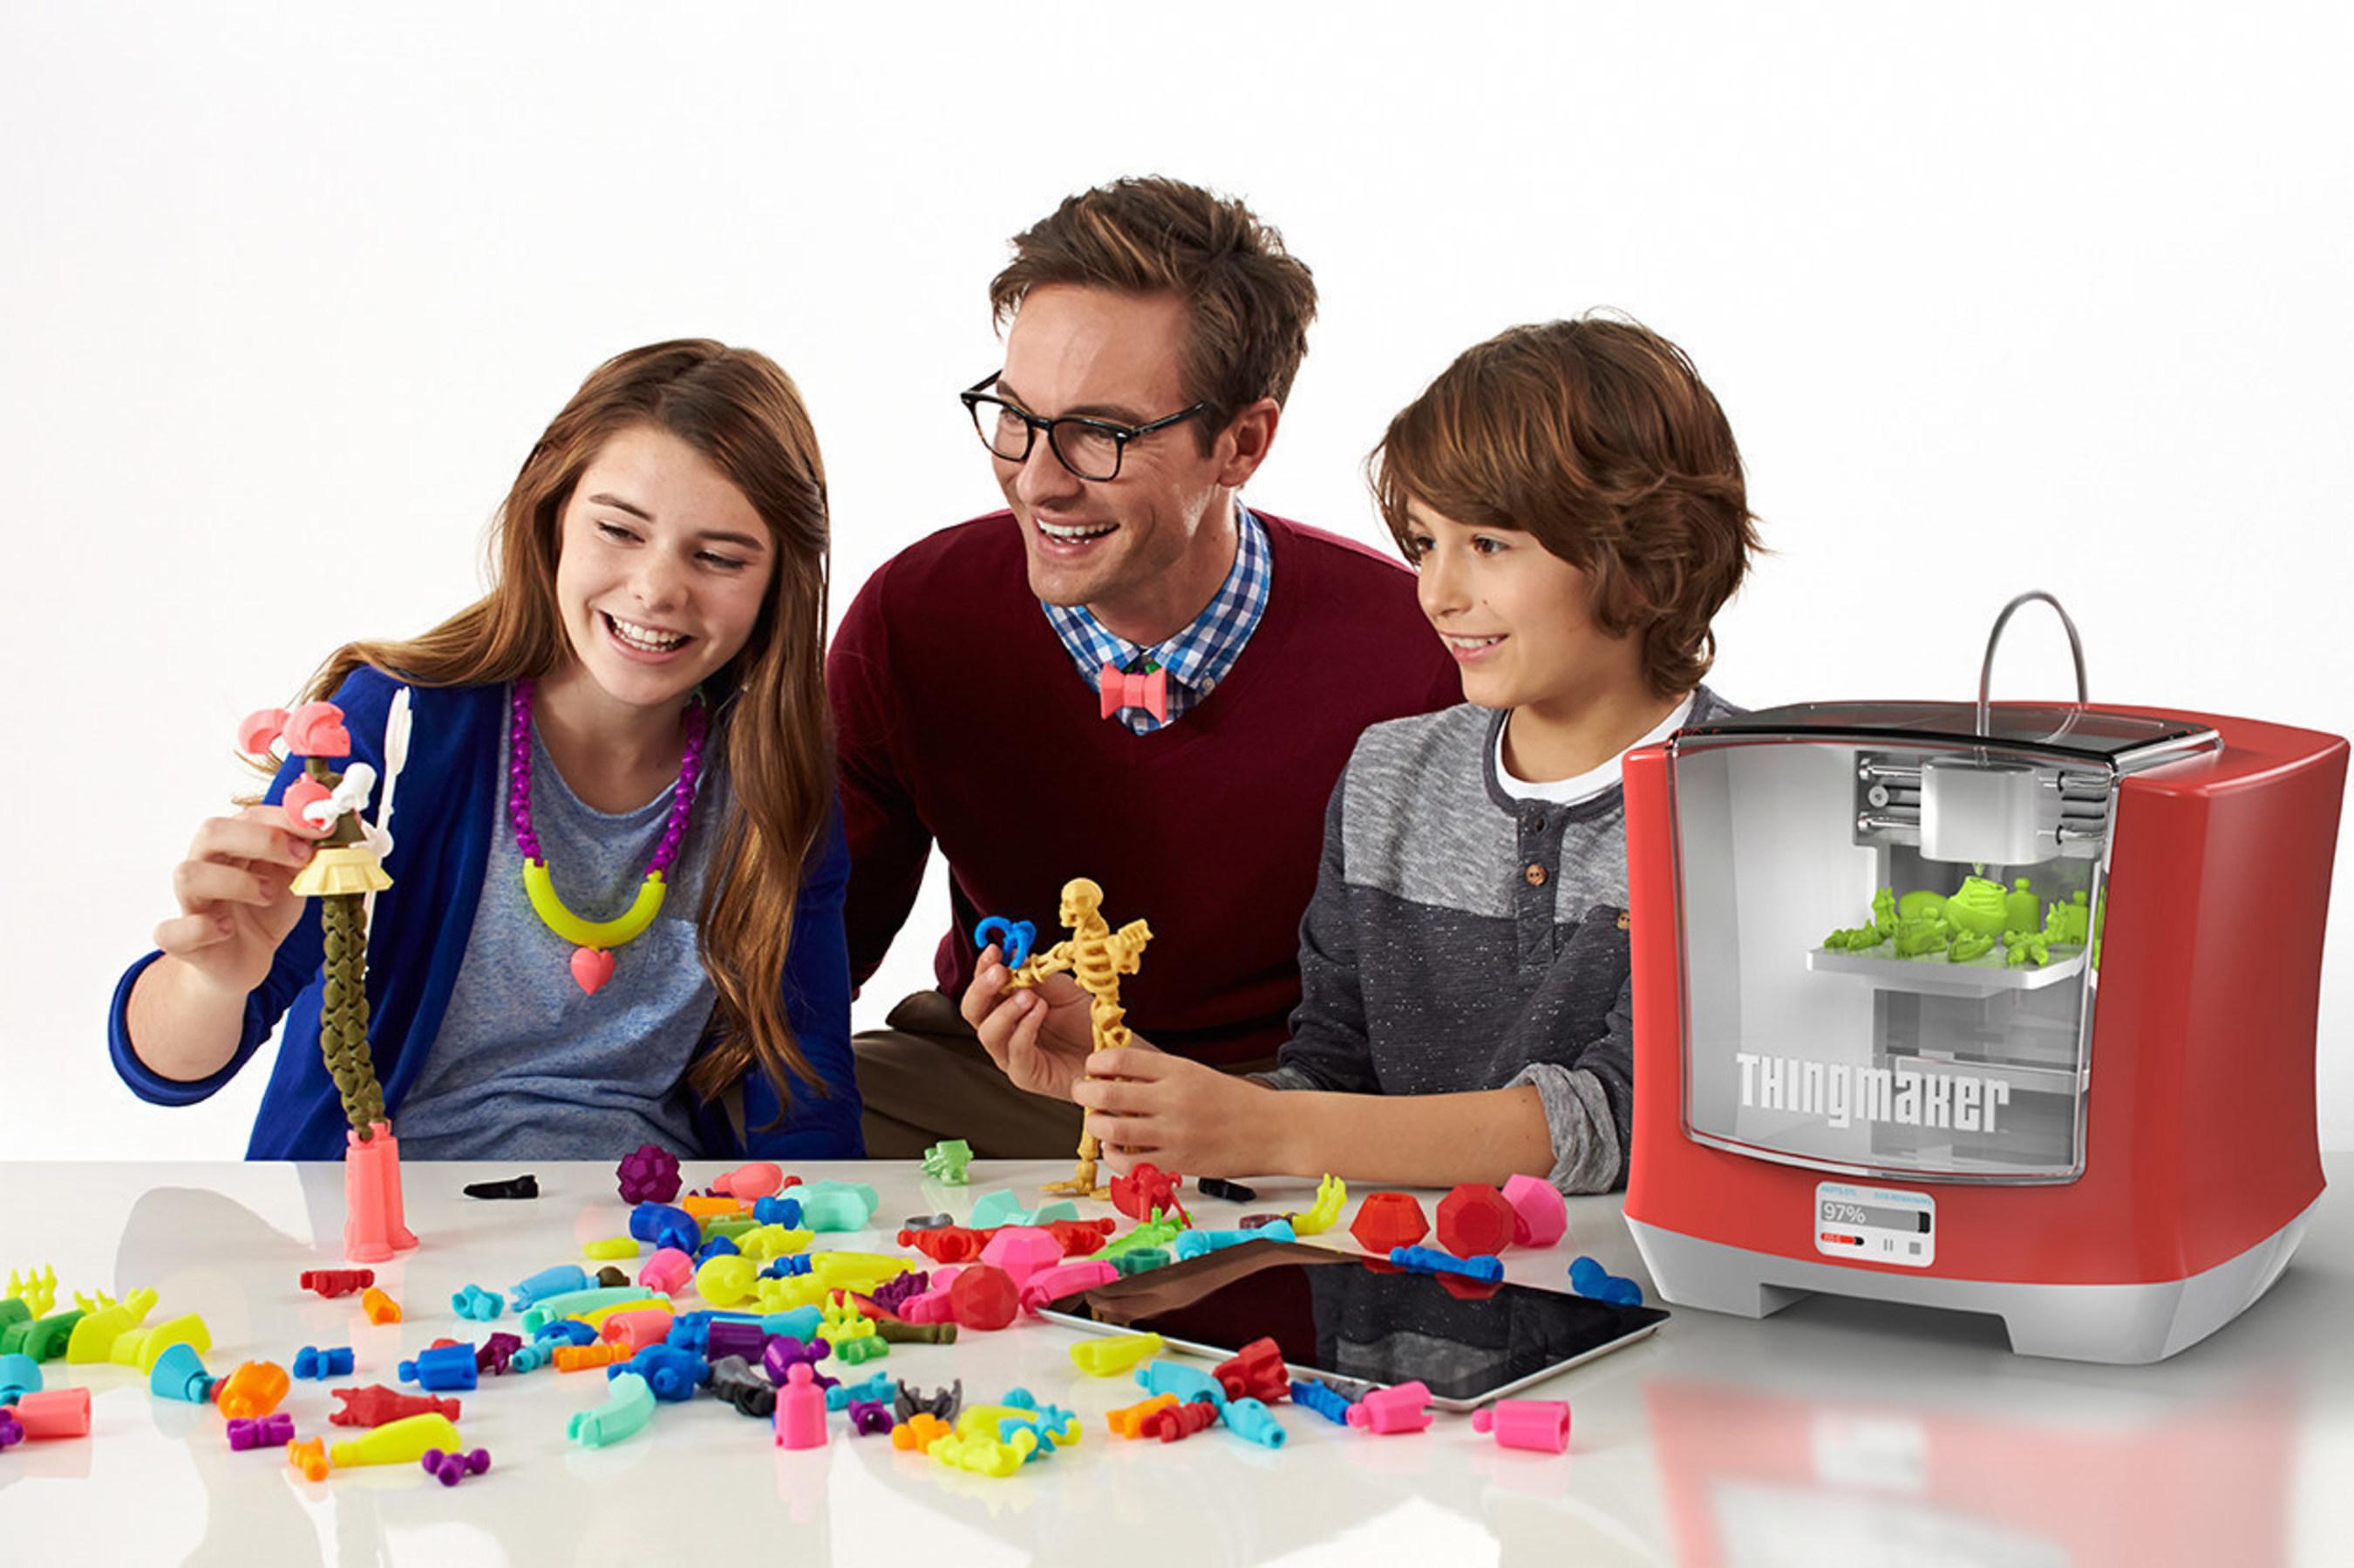 ThingMaker(TM) 3D Printer and ThingMaker Design(TM) App Eco-System